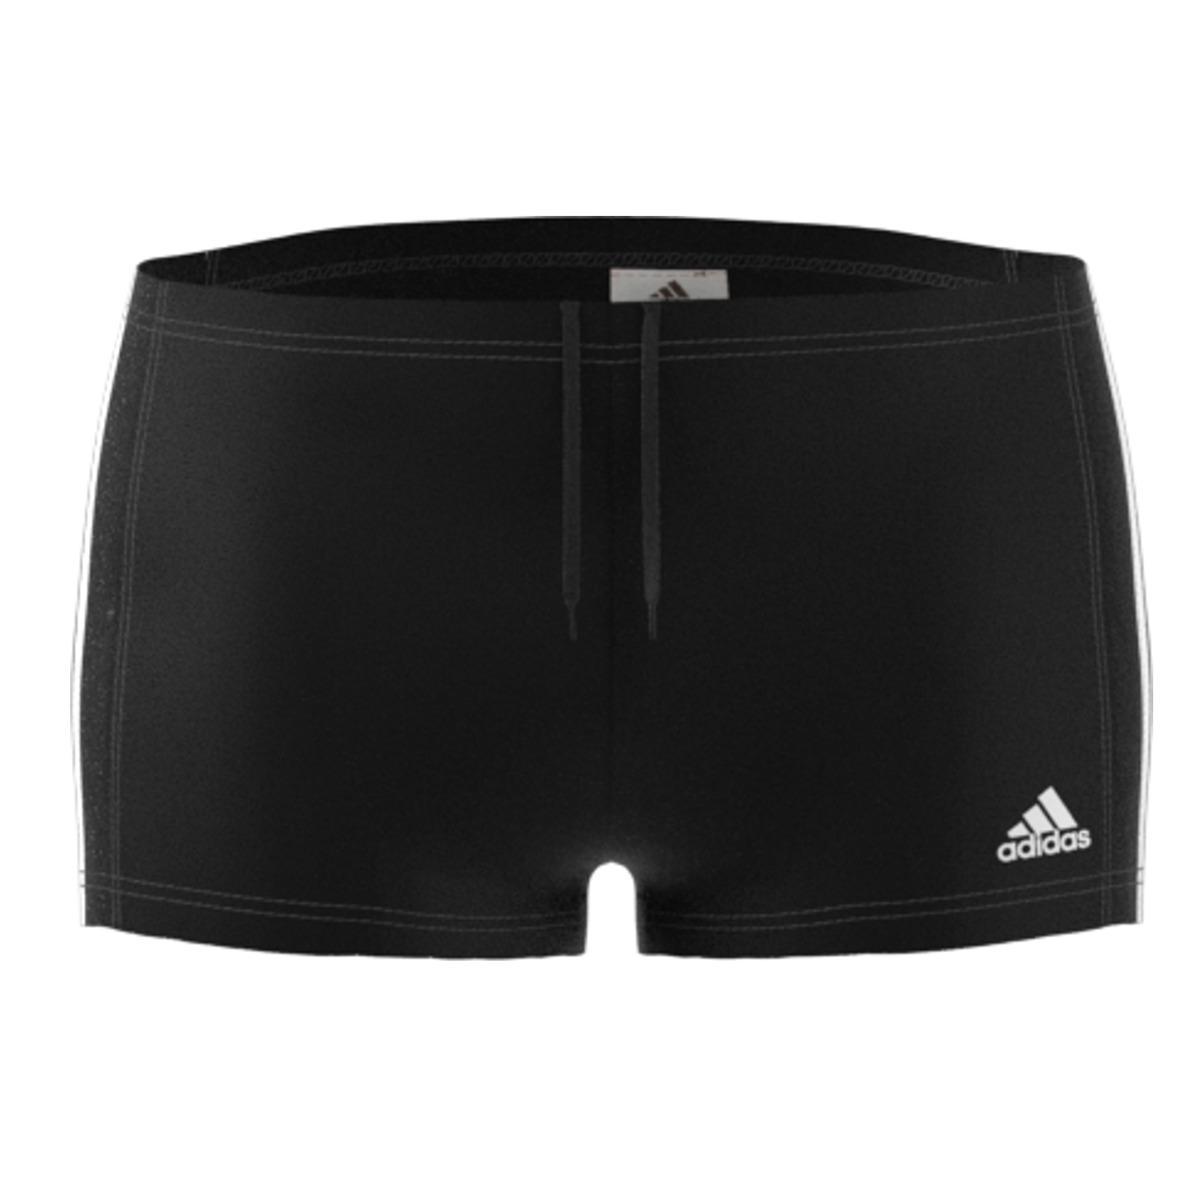 1b26f4b02a adidas Fitness Boxer 3 Stripes Swim Trunks in Black for Men - Lyst